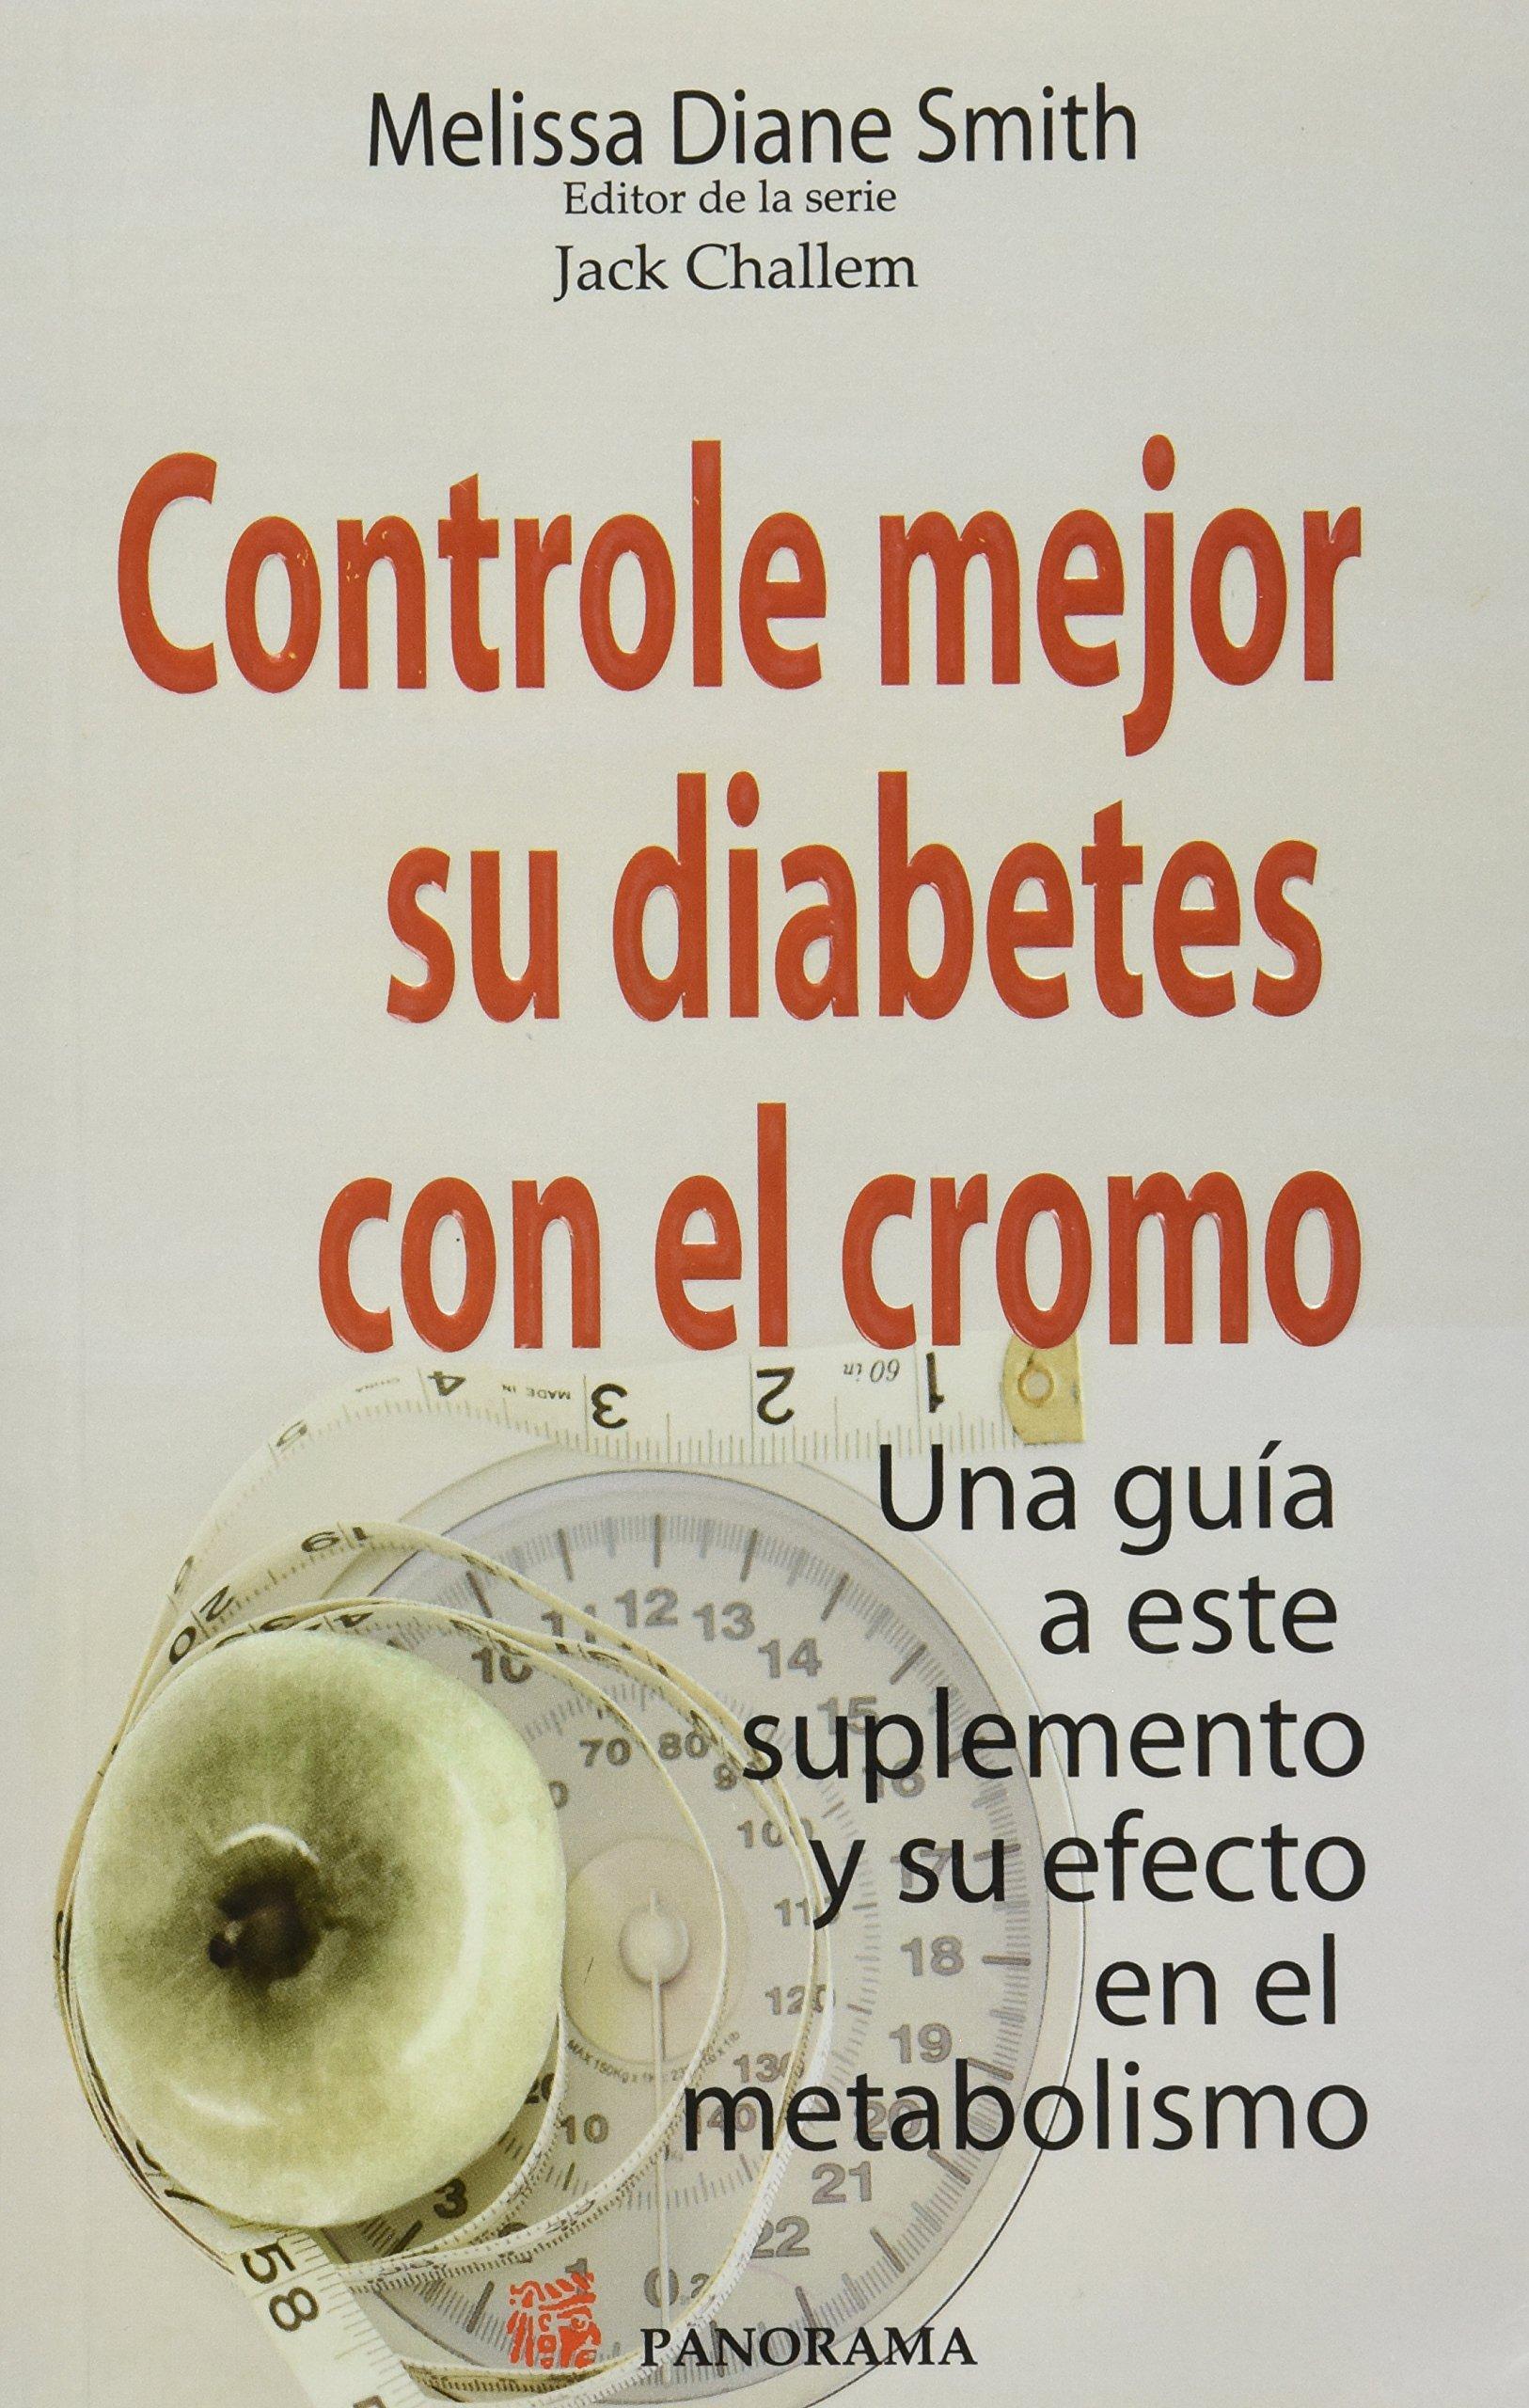 Controle mejor su diabetes con el cromo / Control your diabetes with chromium (Spanish Edition): Melissa Diane Smith: 9786074522730: Amazon.com: Books